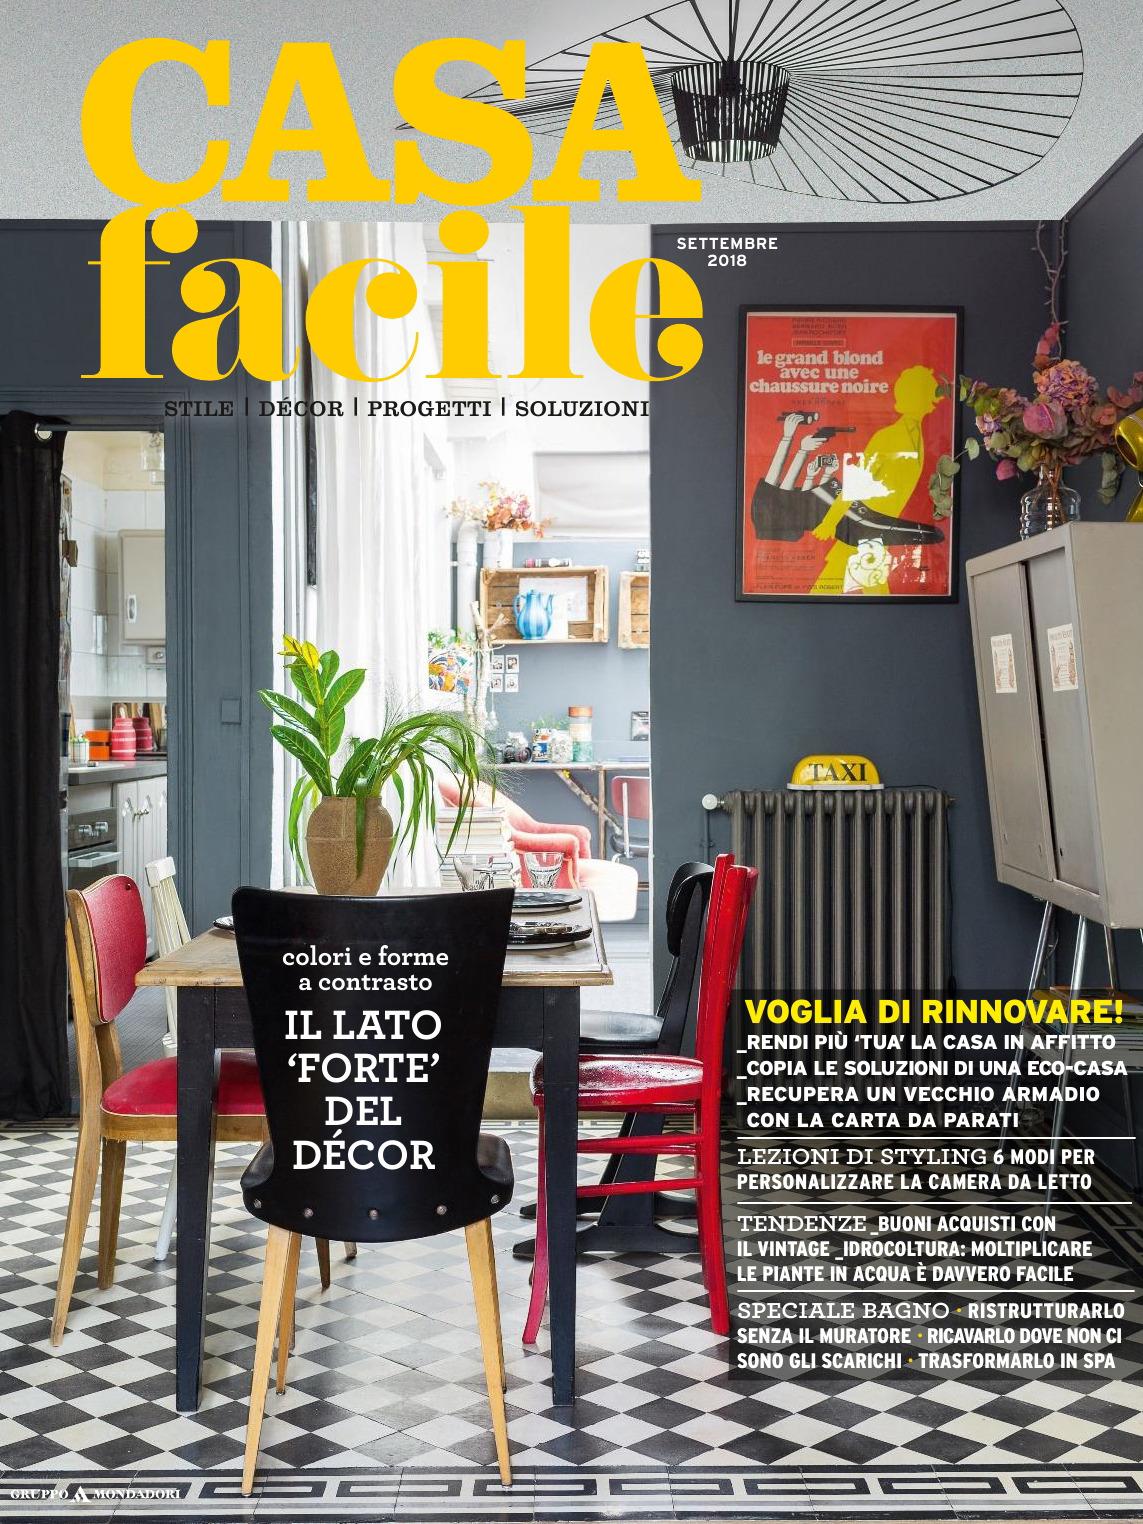 《Casa Facile》意大利家居空间装饰艺术杂志2018年09月号